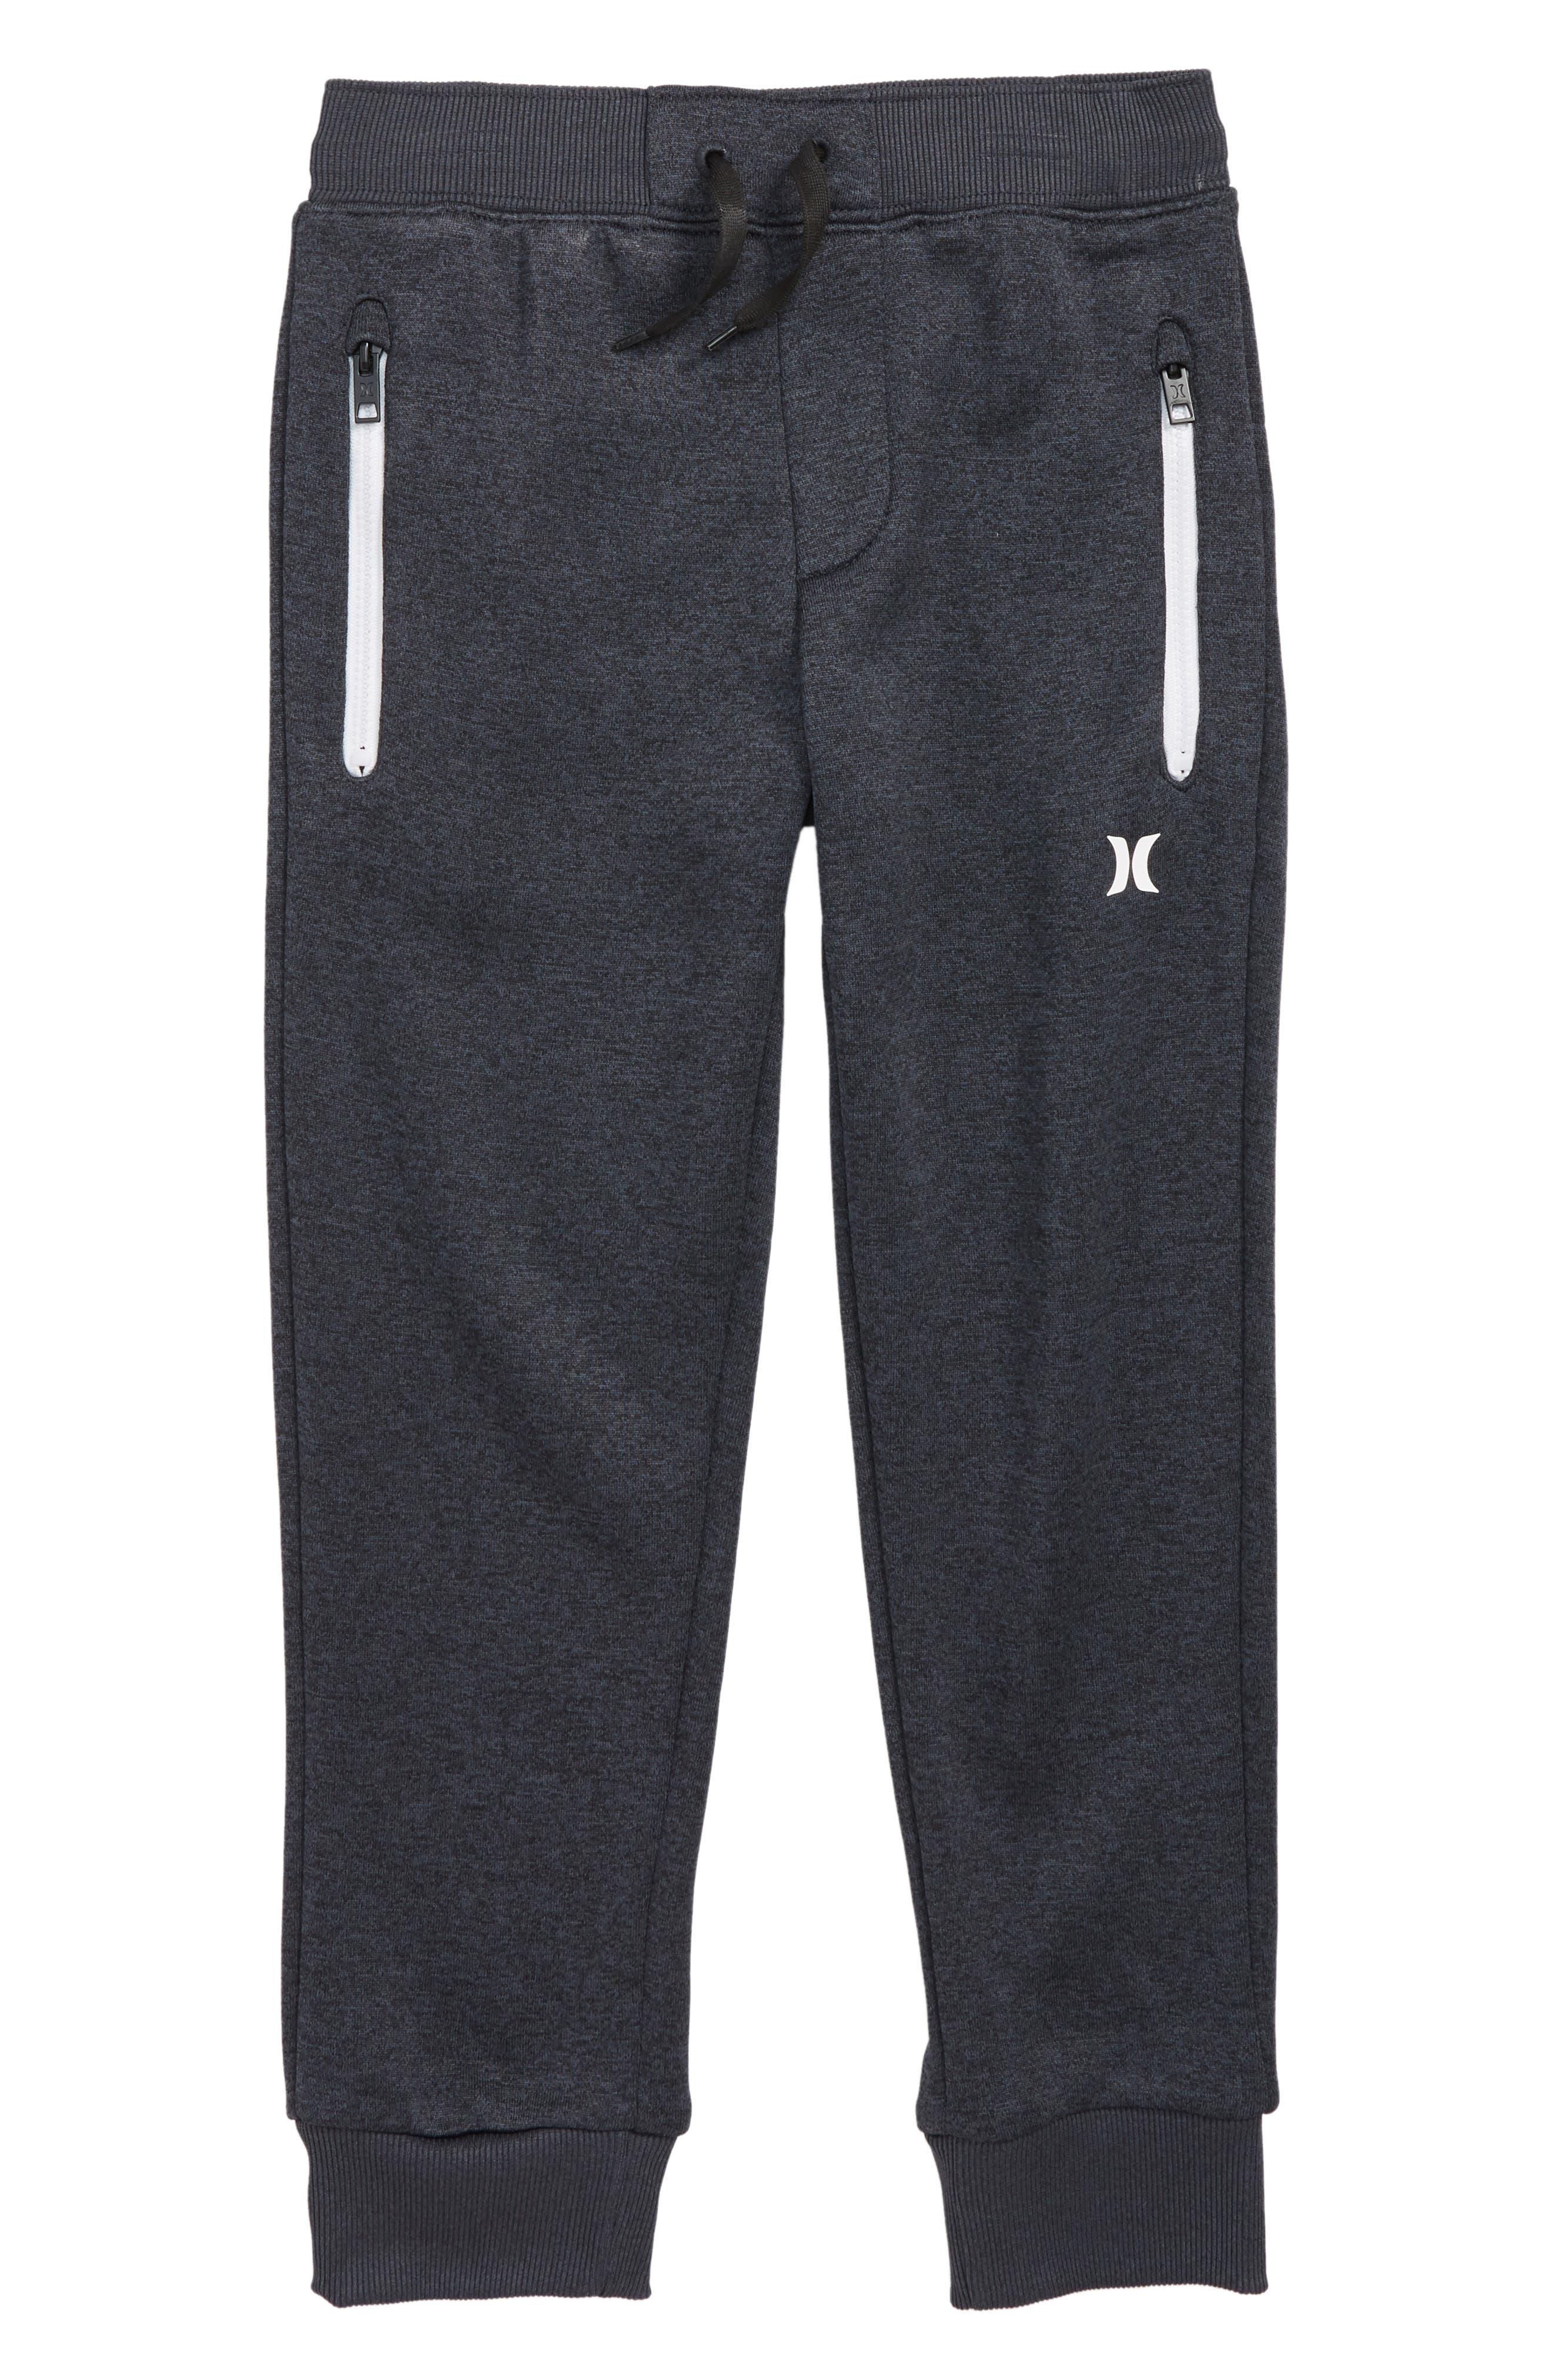 Dri-FIT Solar Jogger Pants,                         Main,                         color, BLACK HEATHER